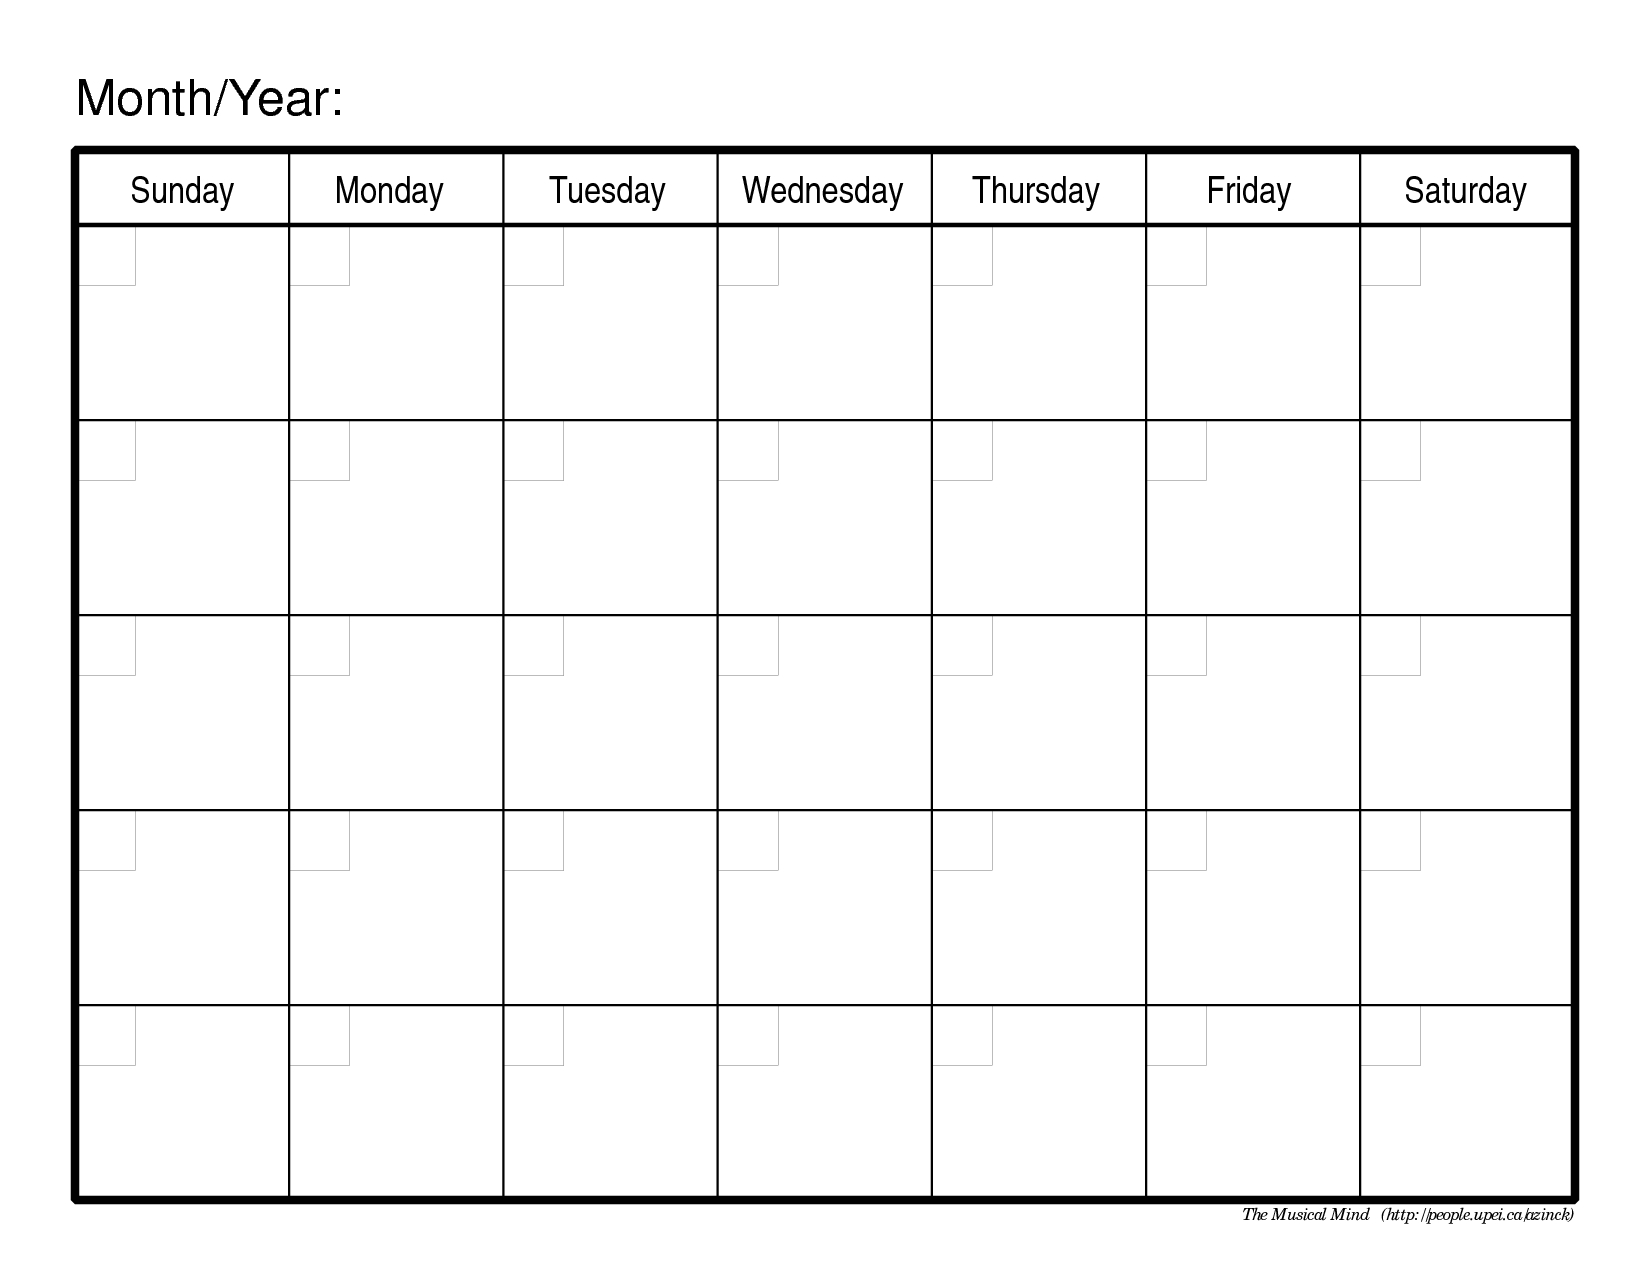 Free Printable Calendar - For My Running Schedule?? | Blank-Free Two Page Blank Printable Calendar